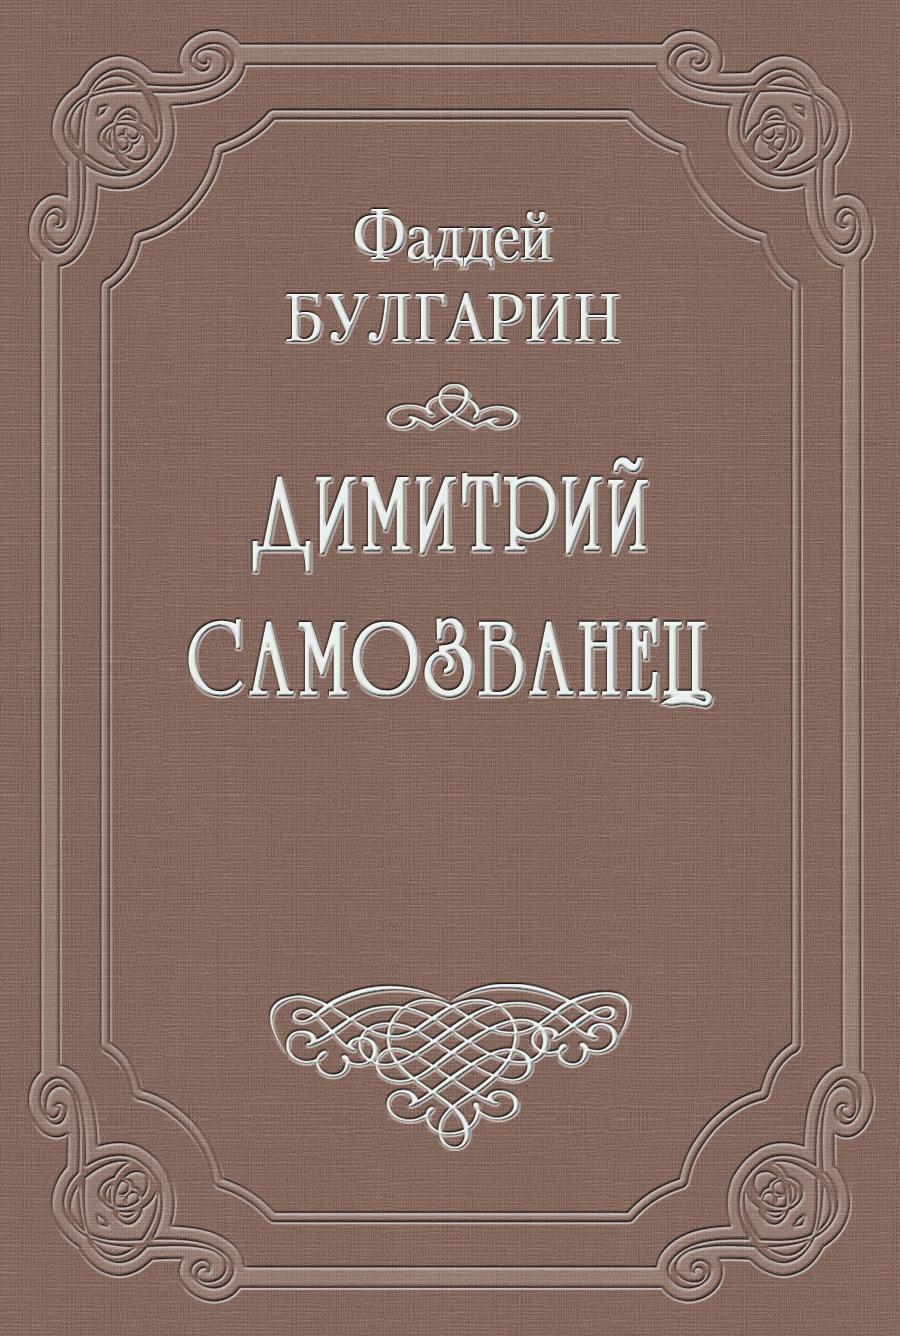 цены Фаддей Булгарин Димитрий Самозванец